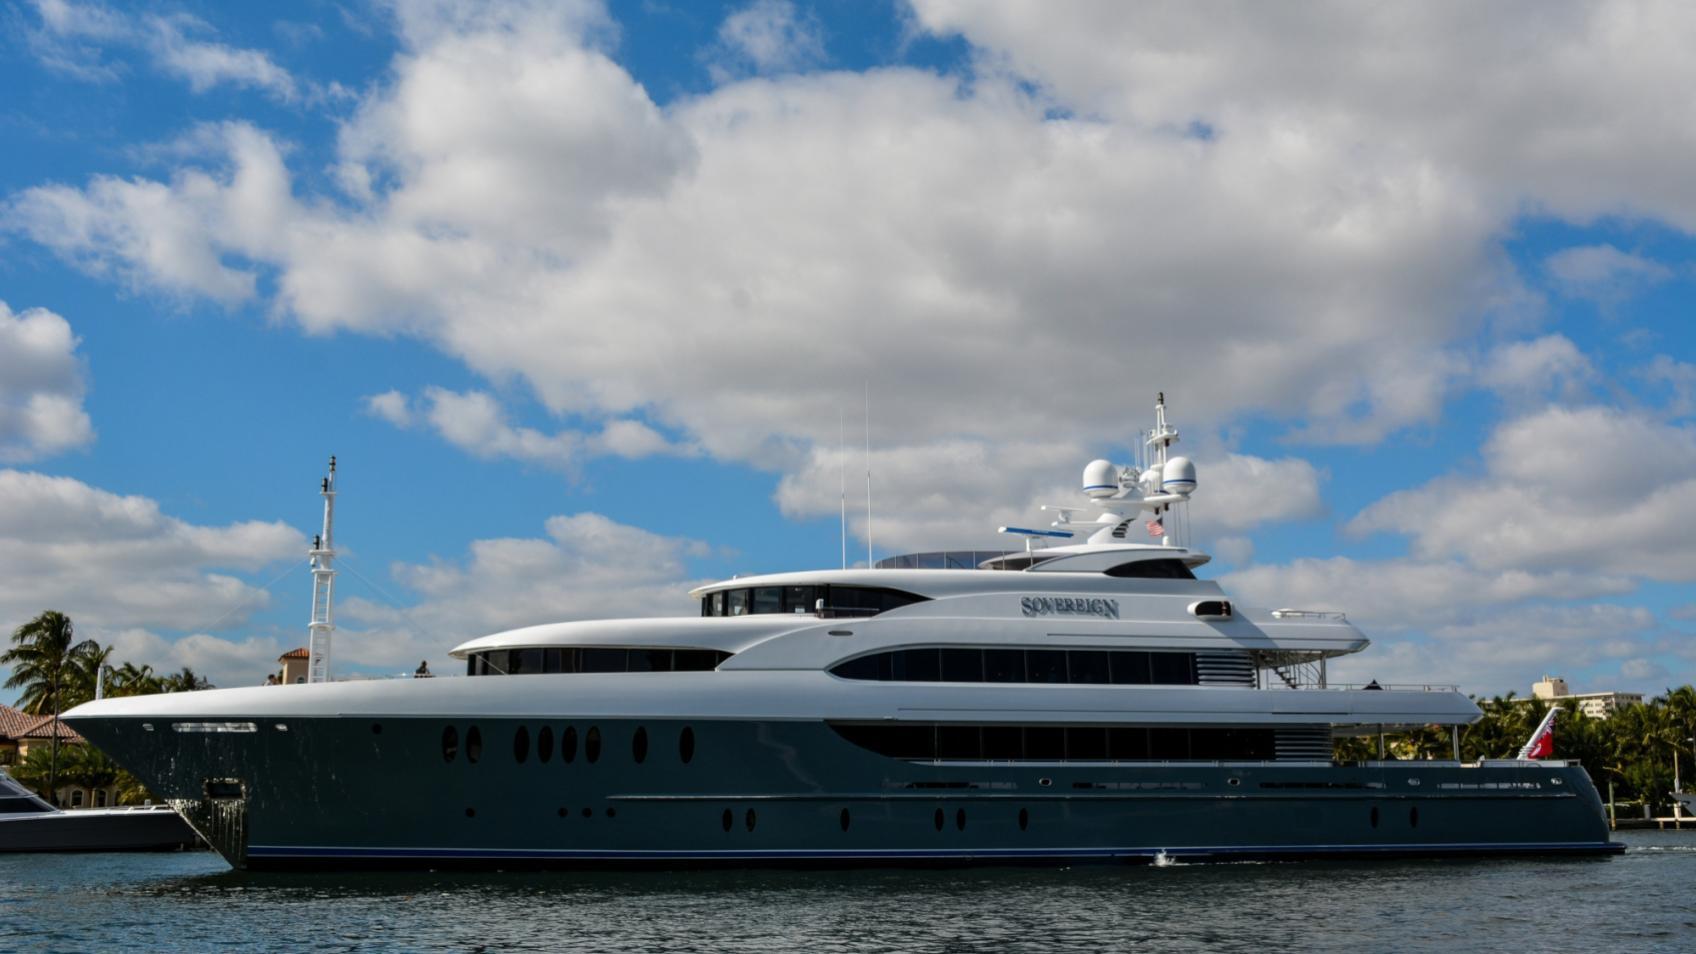 soverign motor yacht for sale